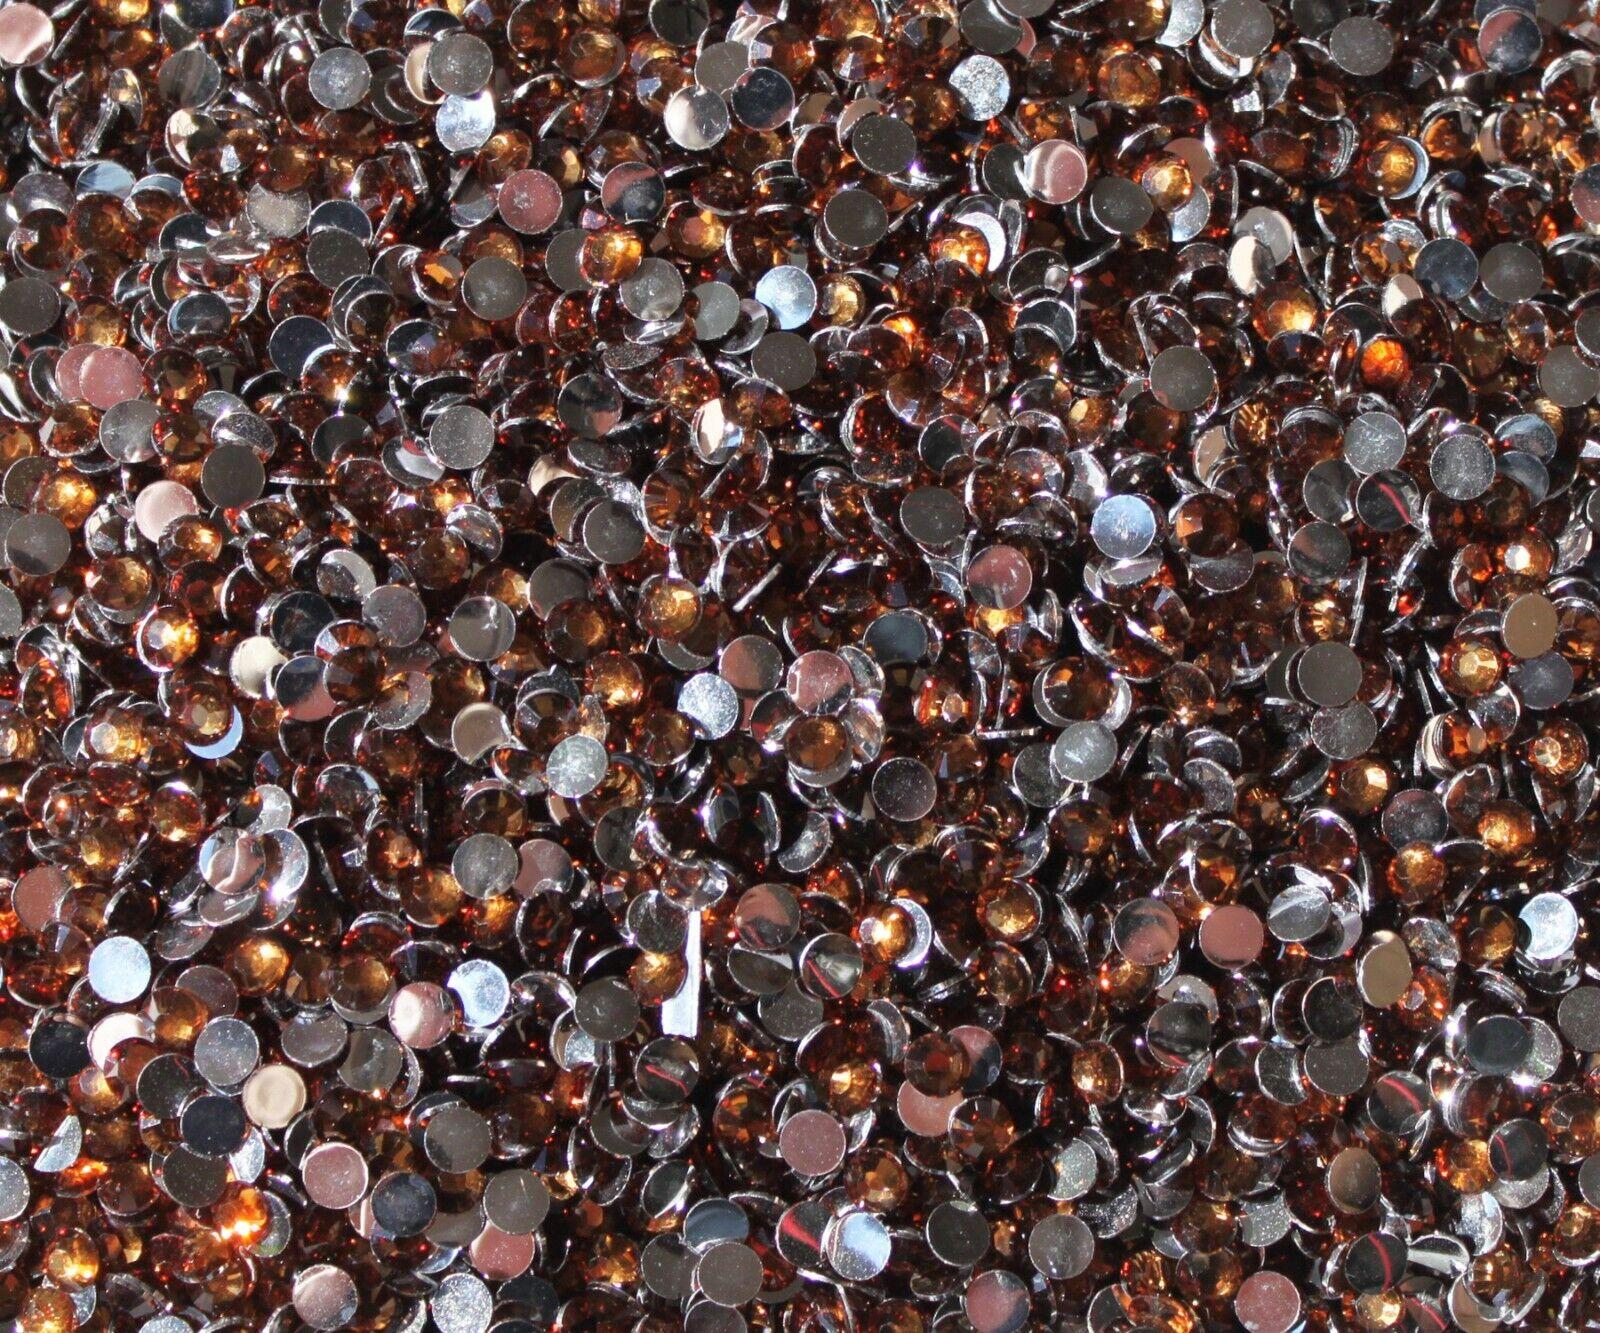 1000 Crystal Flat Back Resin Rhinestones Gems 60 colors, 2mm, 3mm, 4mm, 5mm, 6.5 COFFEE